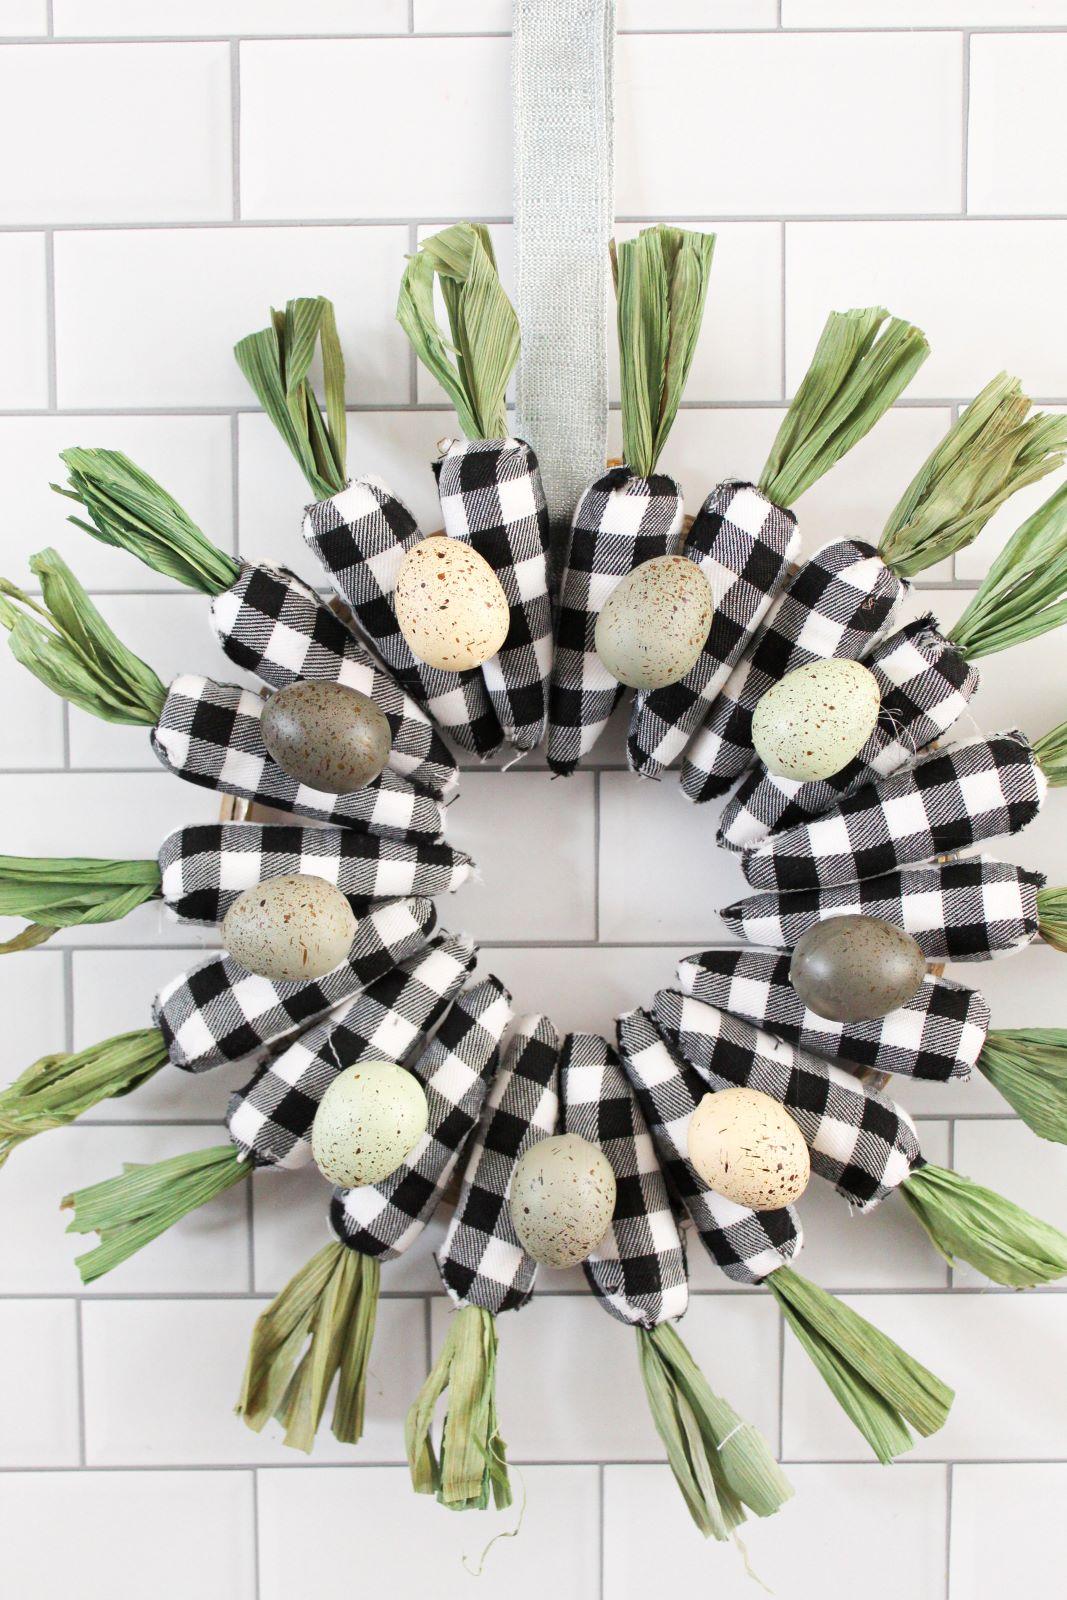 Vertical Farmhouse Plaid Carrot Wreath for Easter 1